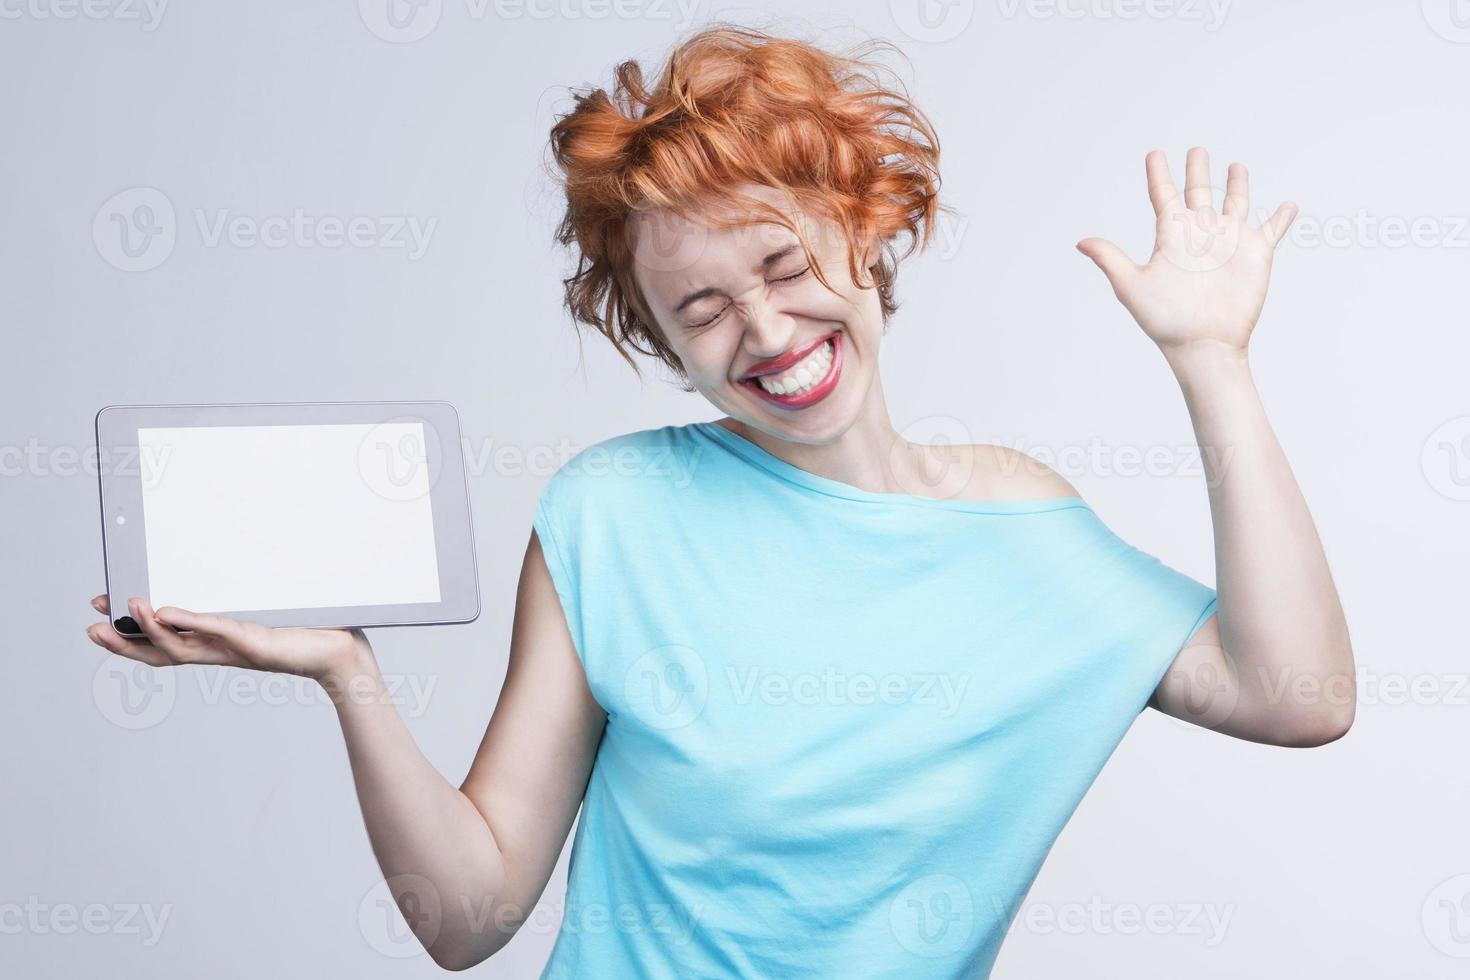 Chica pelirroja emocional sosteniendo una tableta foto